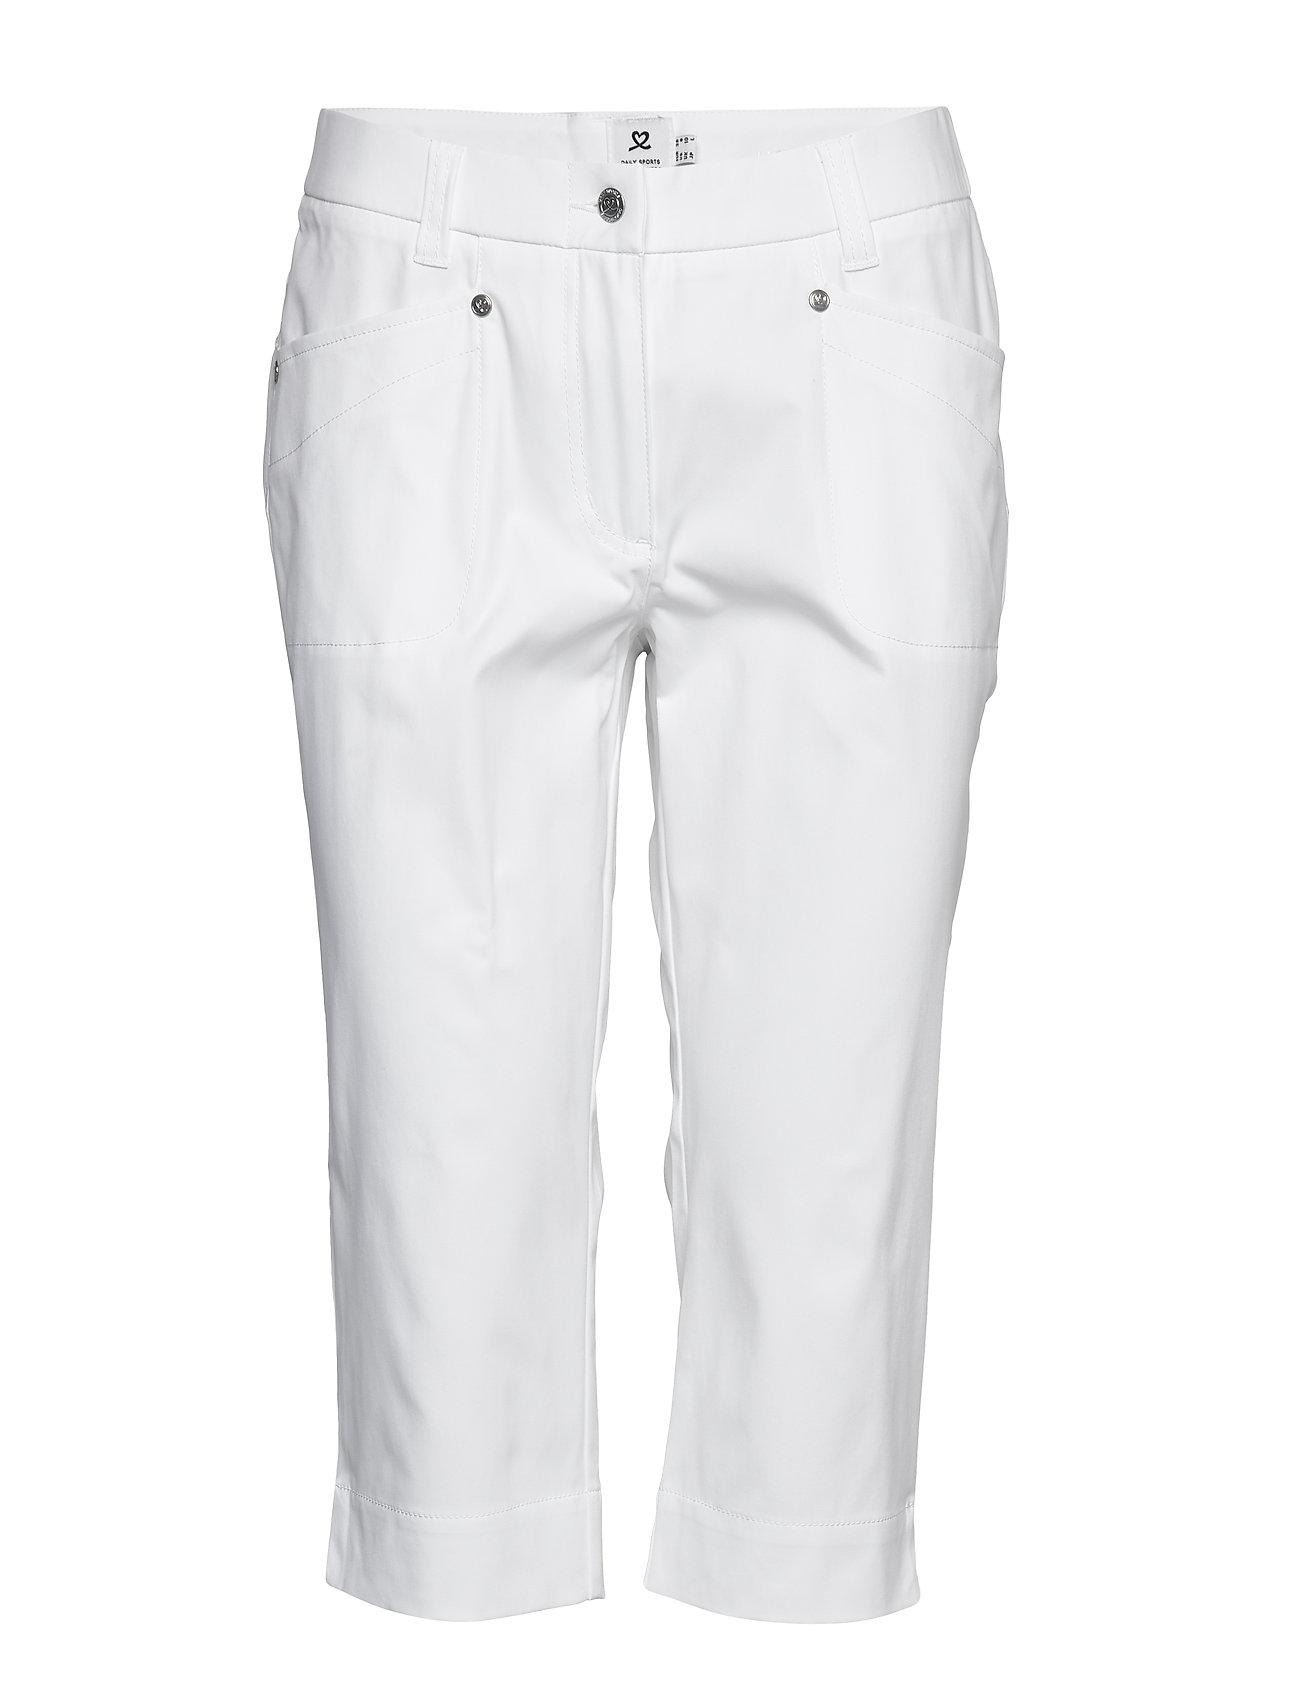 Image of Lyric Capri 74 Cm Sport Pants Hvid Daily Sports (3446804137)